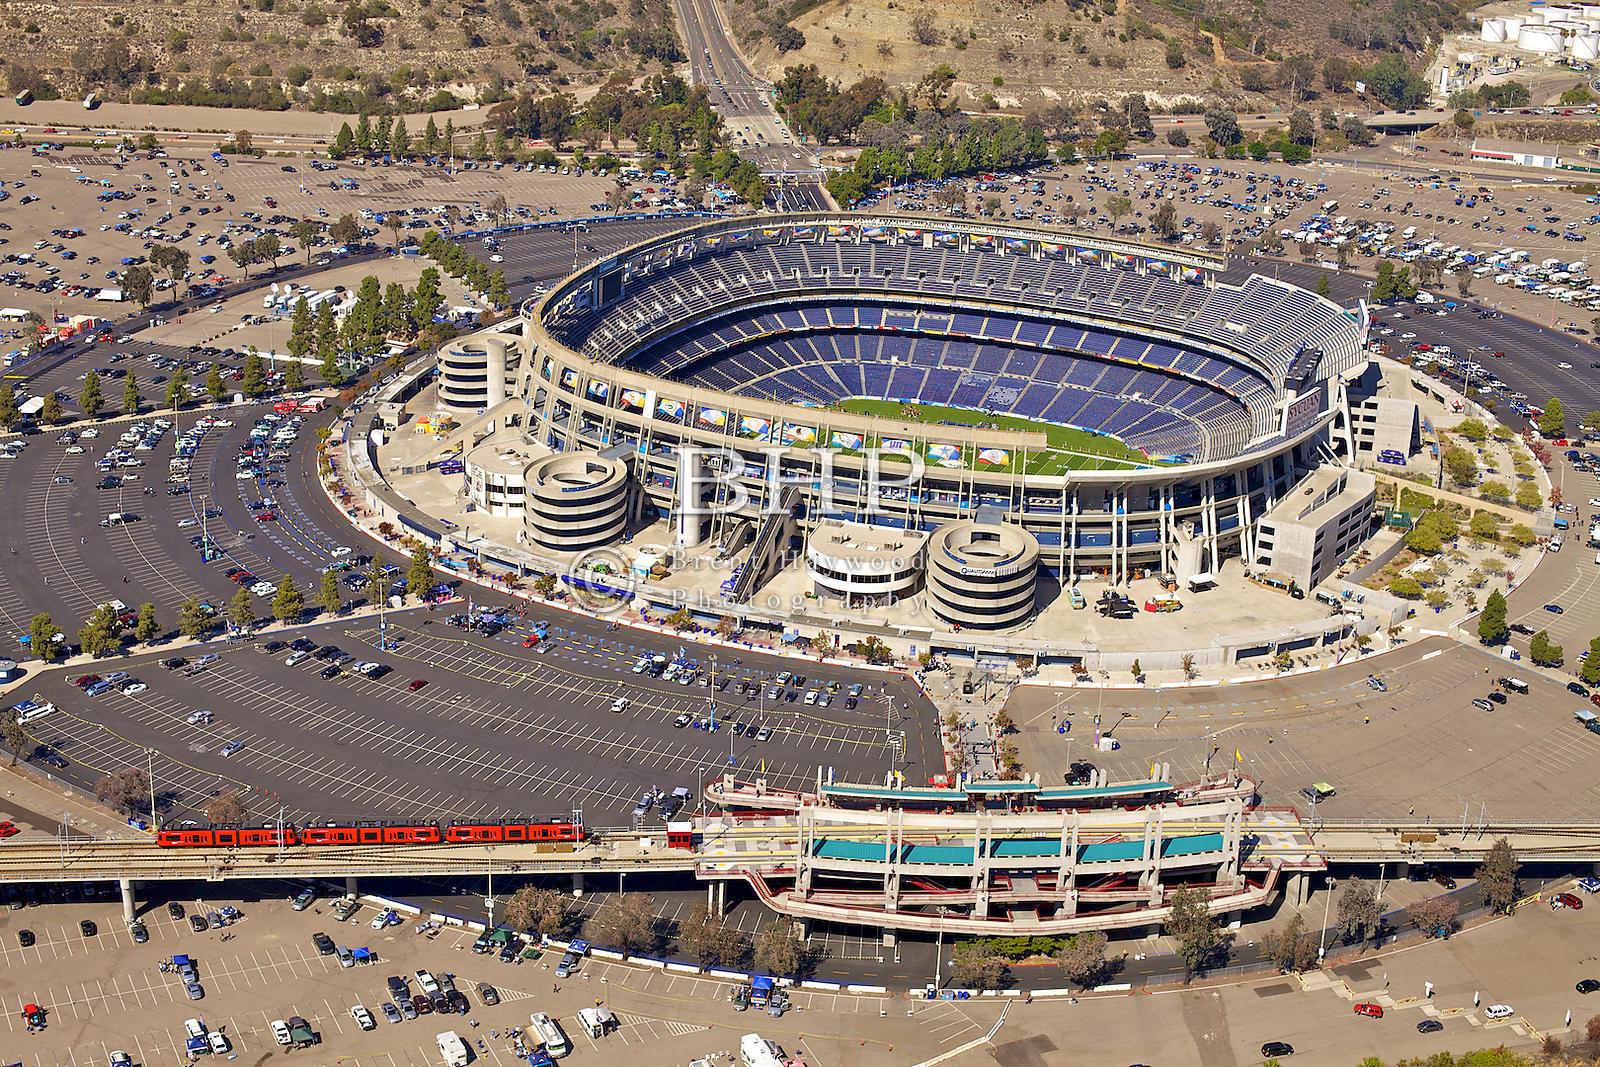 Brent Haywood Photography Qualcomm Stadium Aerial Photo